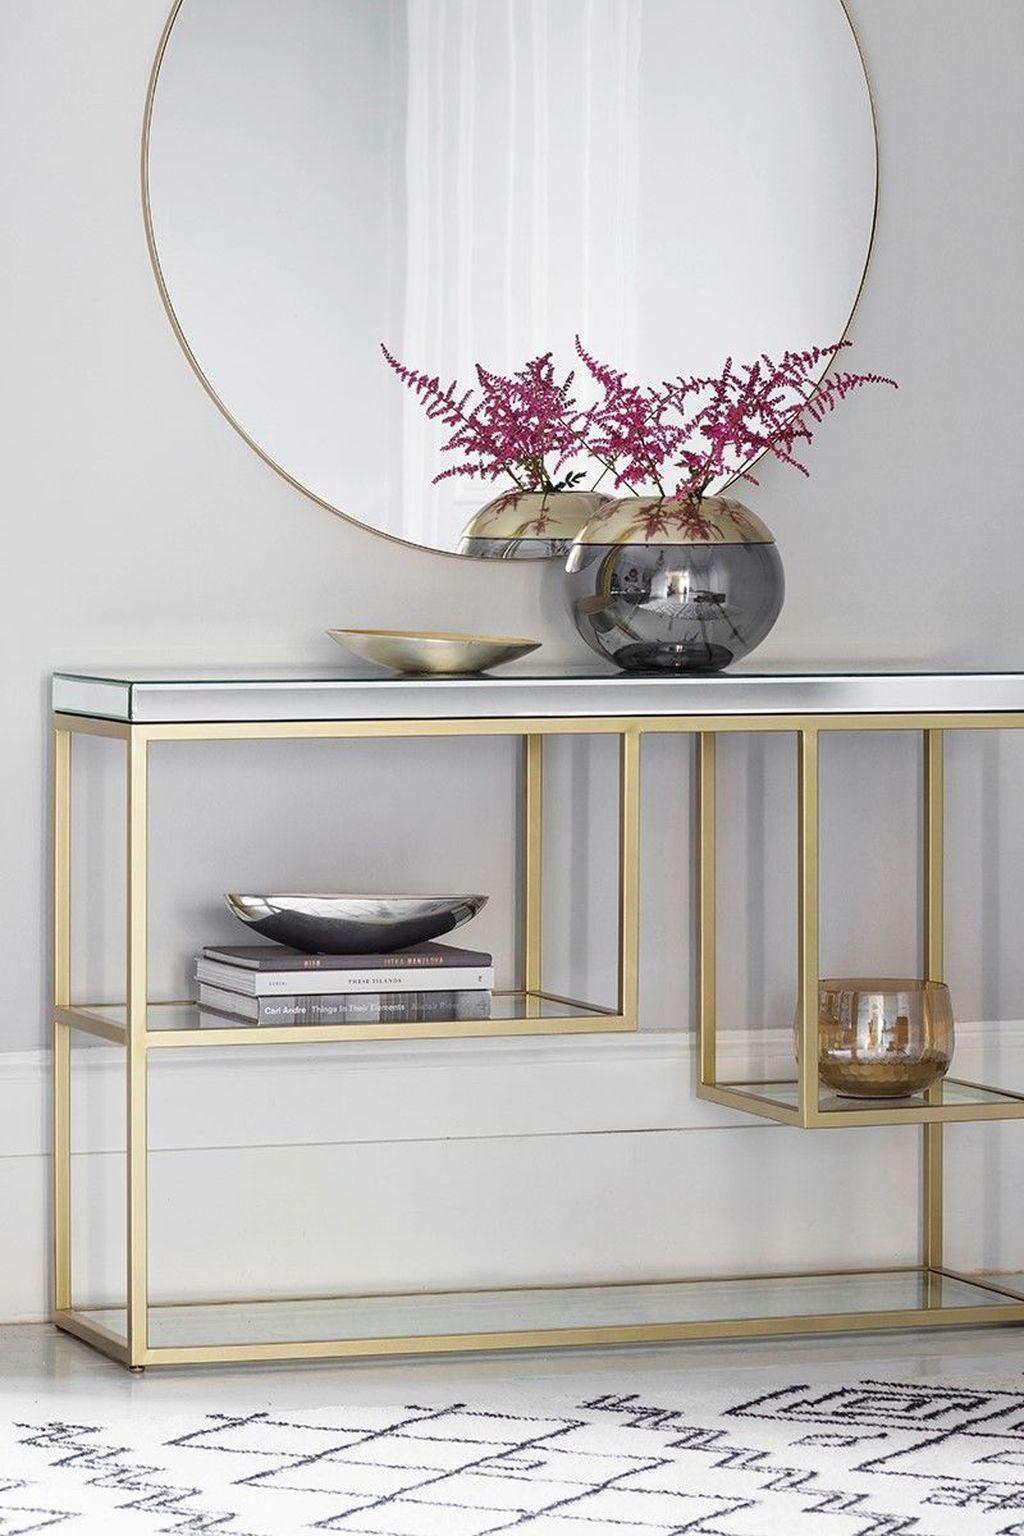 50 Inspiring Console Table Ideas Homyhomee Console Table Living Room Console Table Decorating Foyer Decor